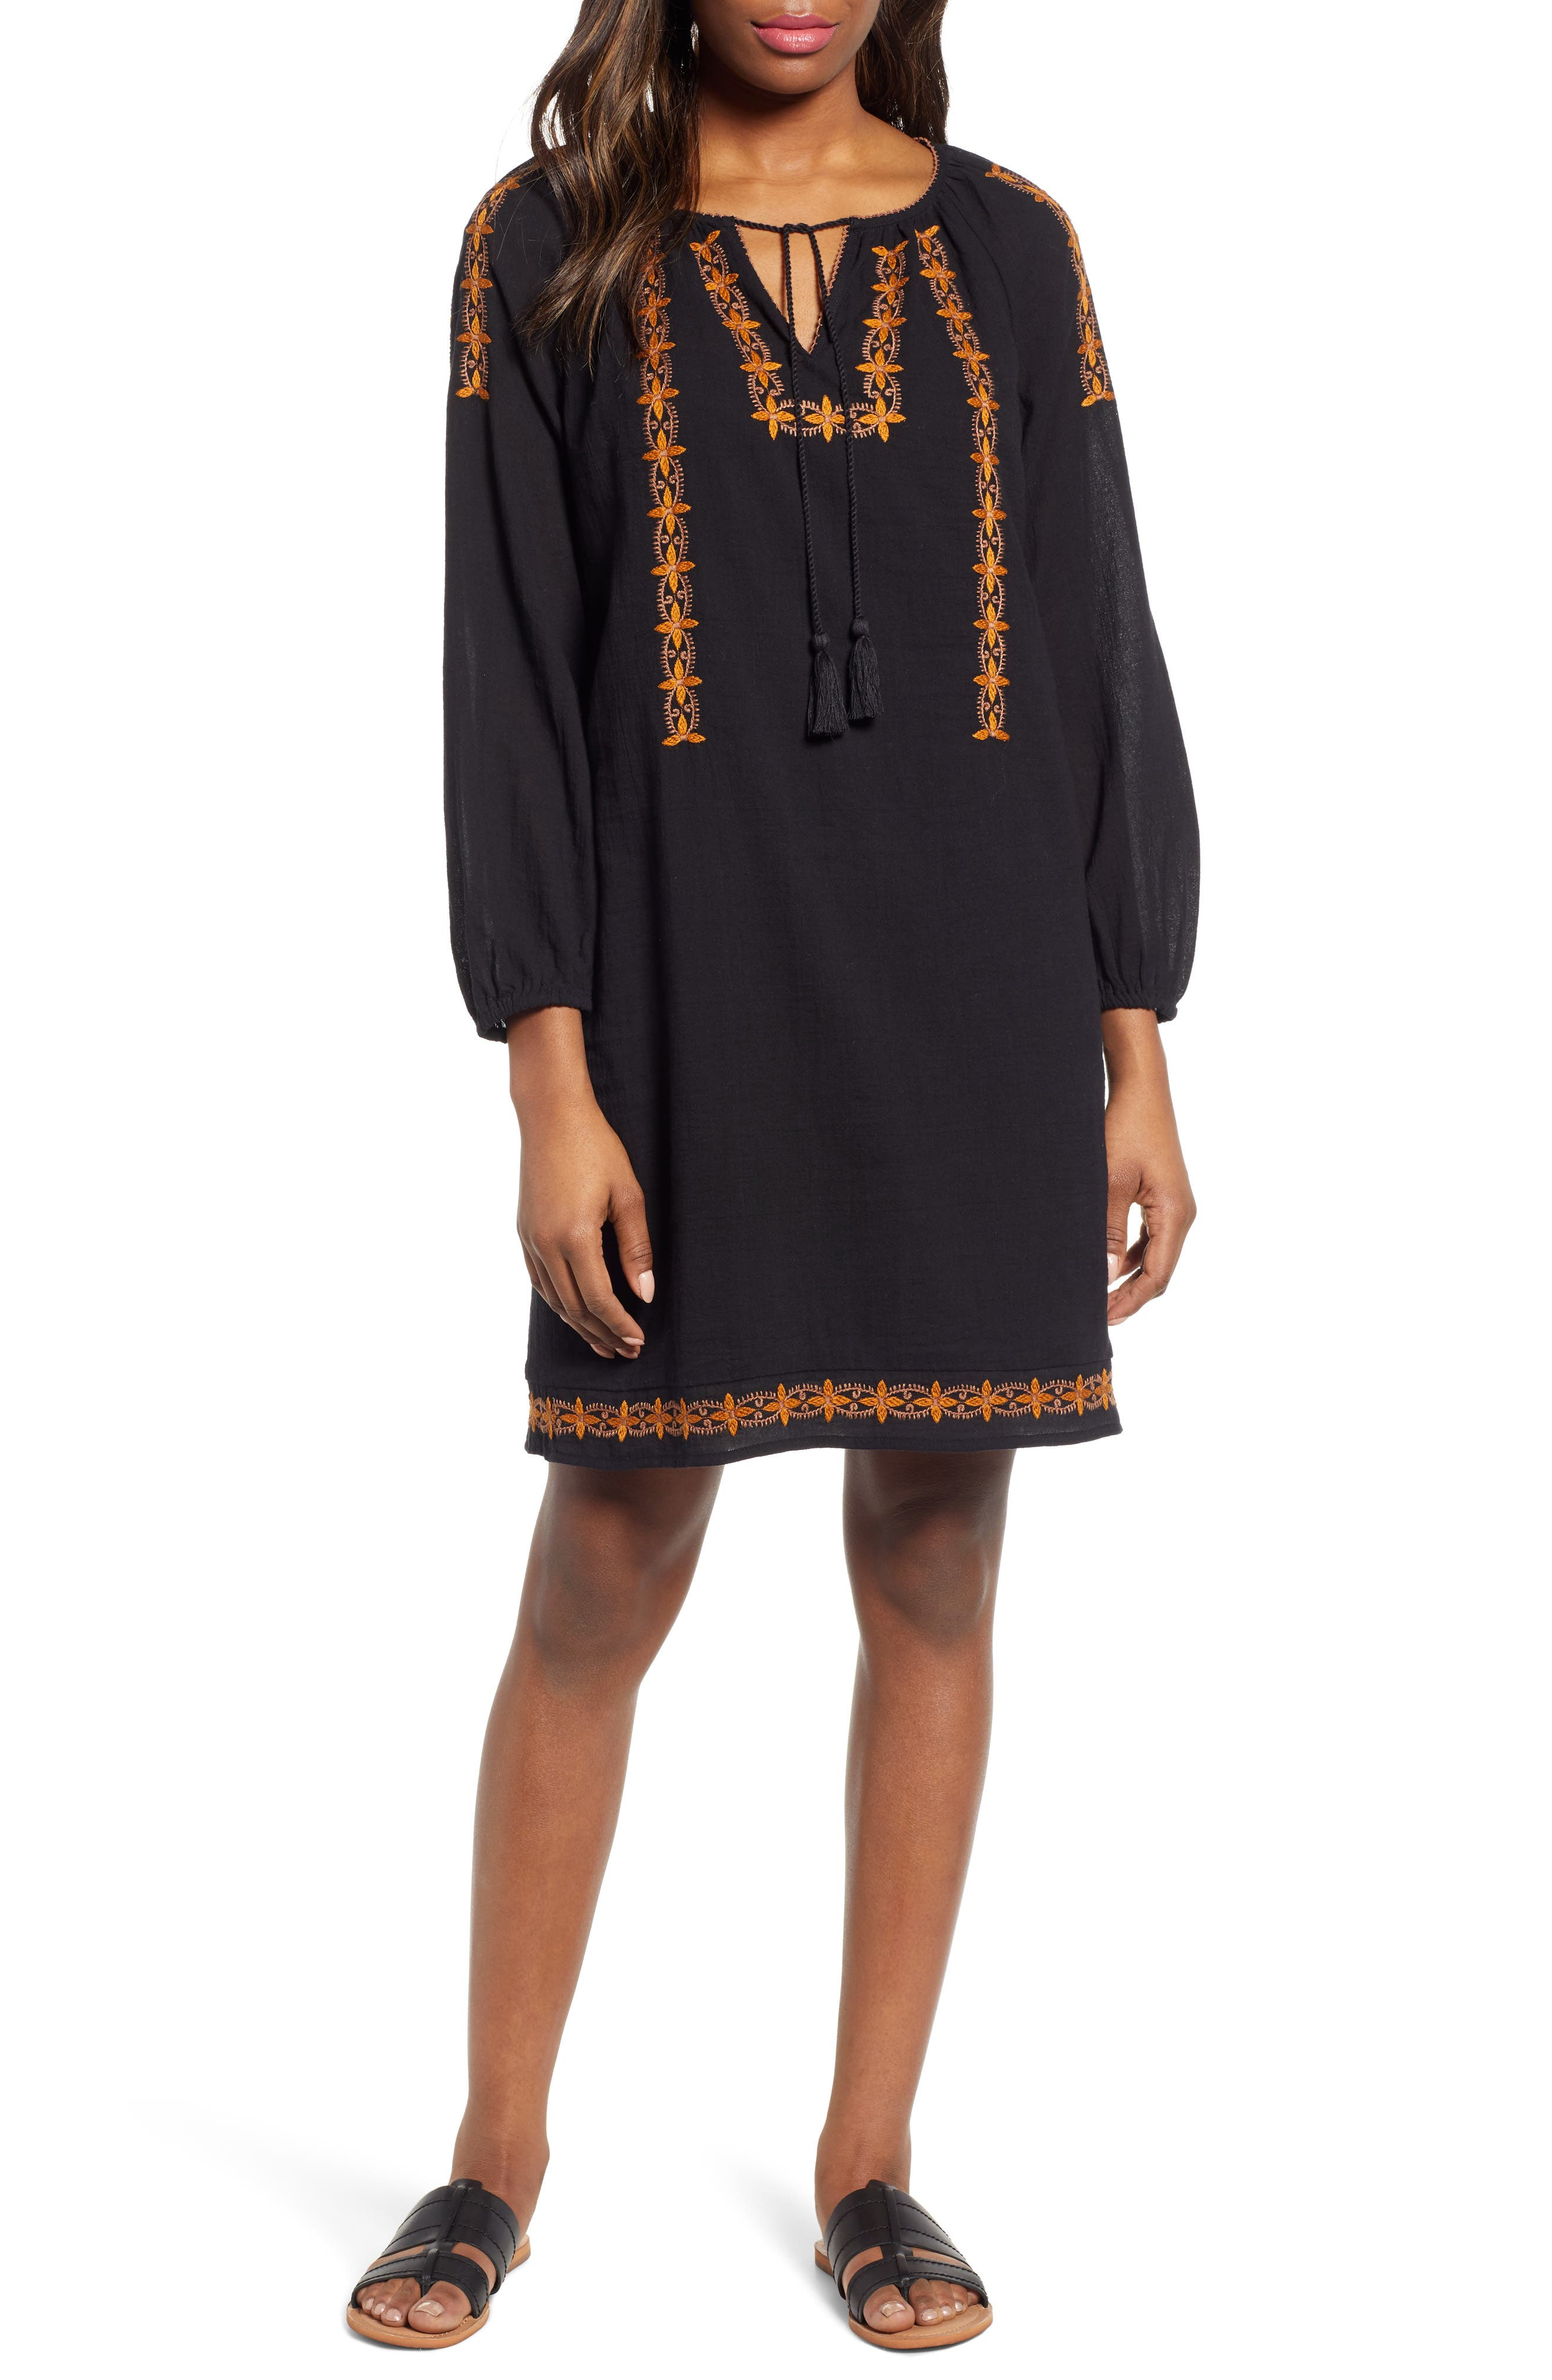 70s Dresses – Disco Dress, Hippie Dress, Wrap Dress Womens Lucky Brand Kelly Shift Dress $119.00 AT vintagedancer.com